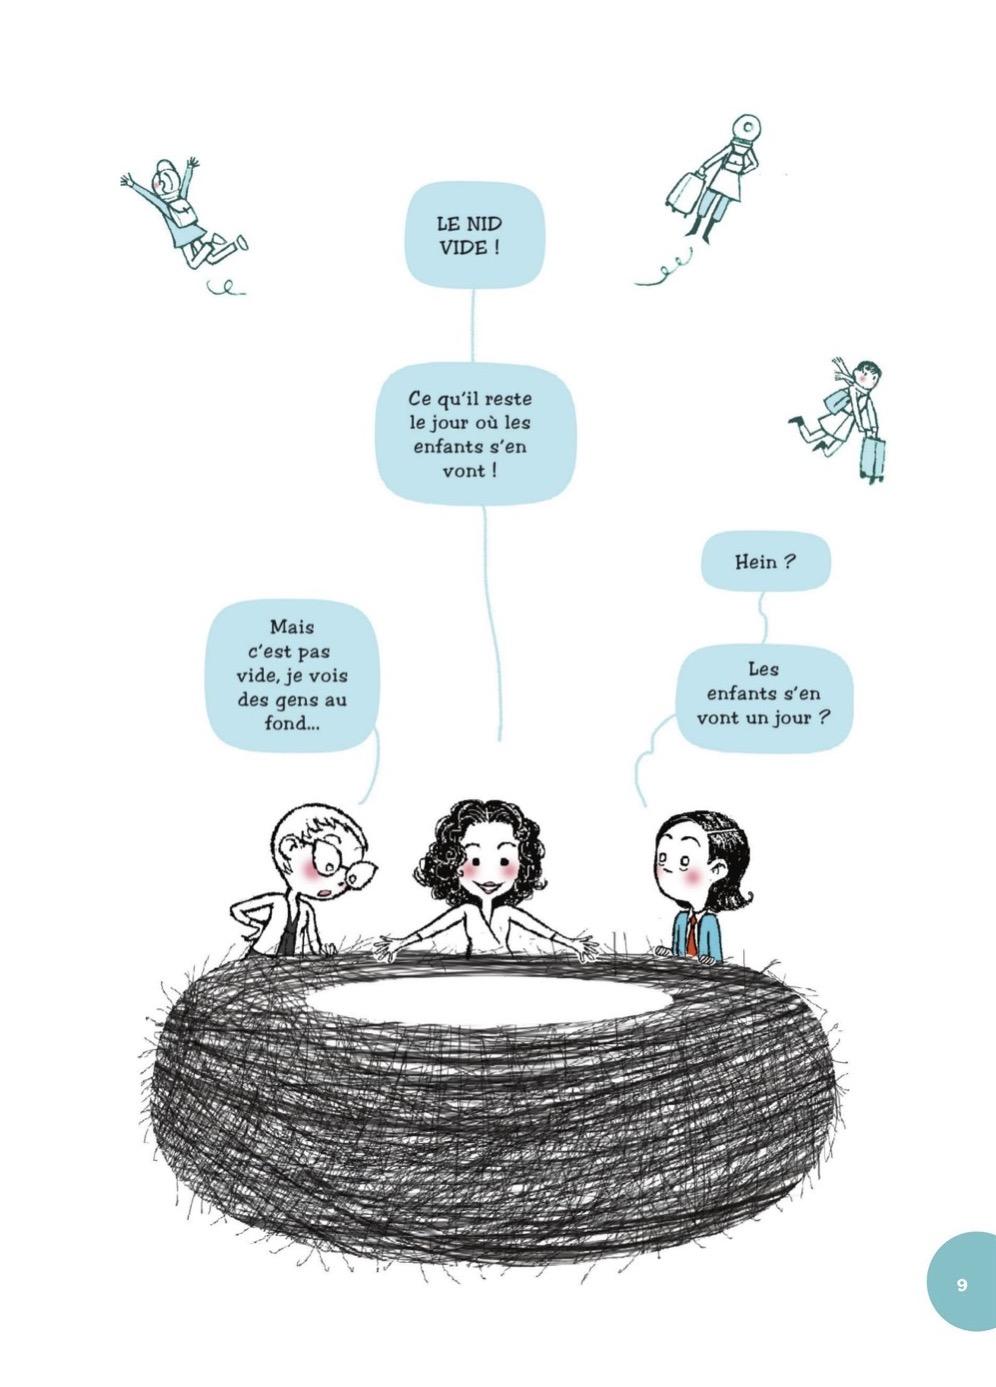 le syndrome du nid vide page 4